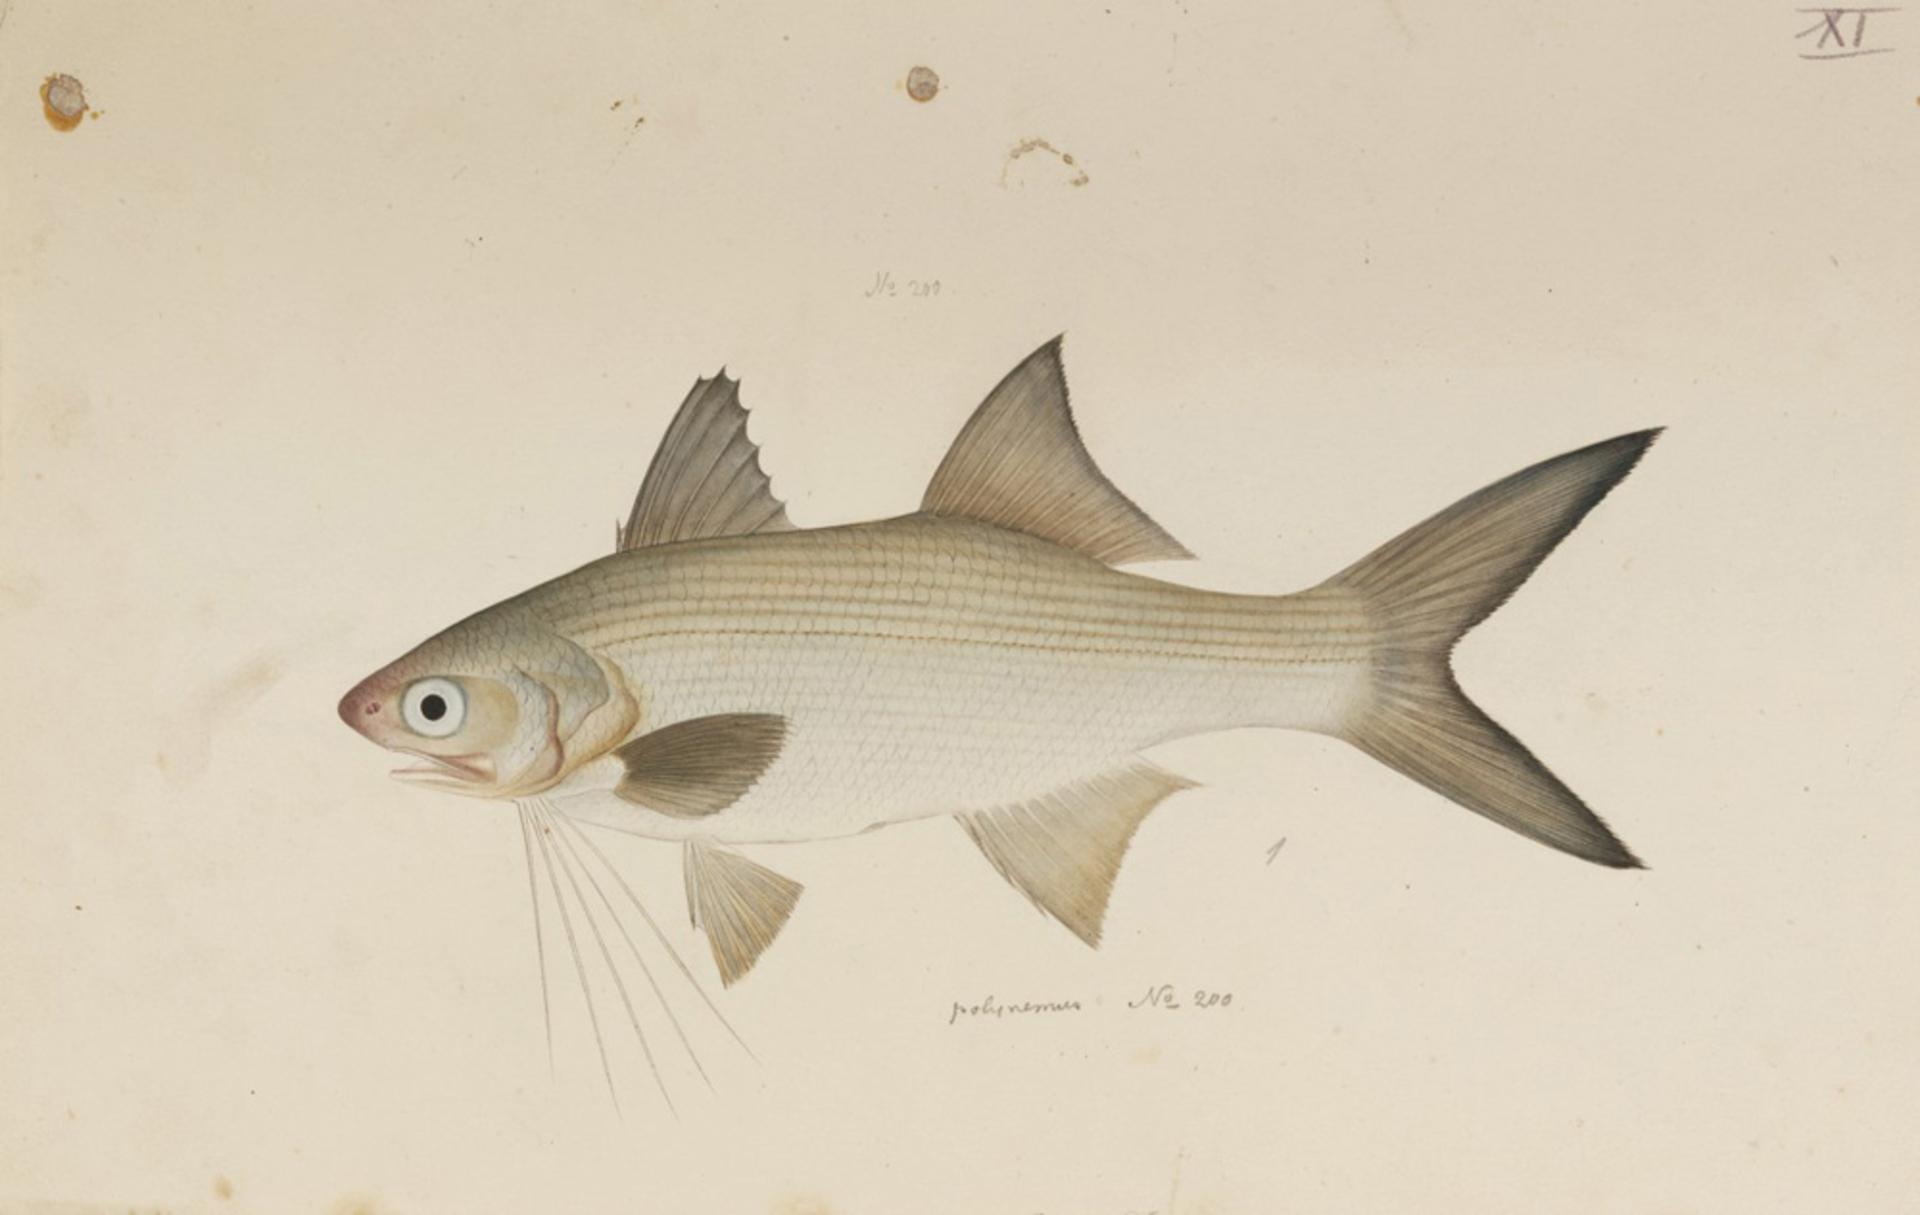 Image of striped threadfin